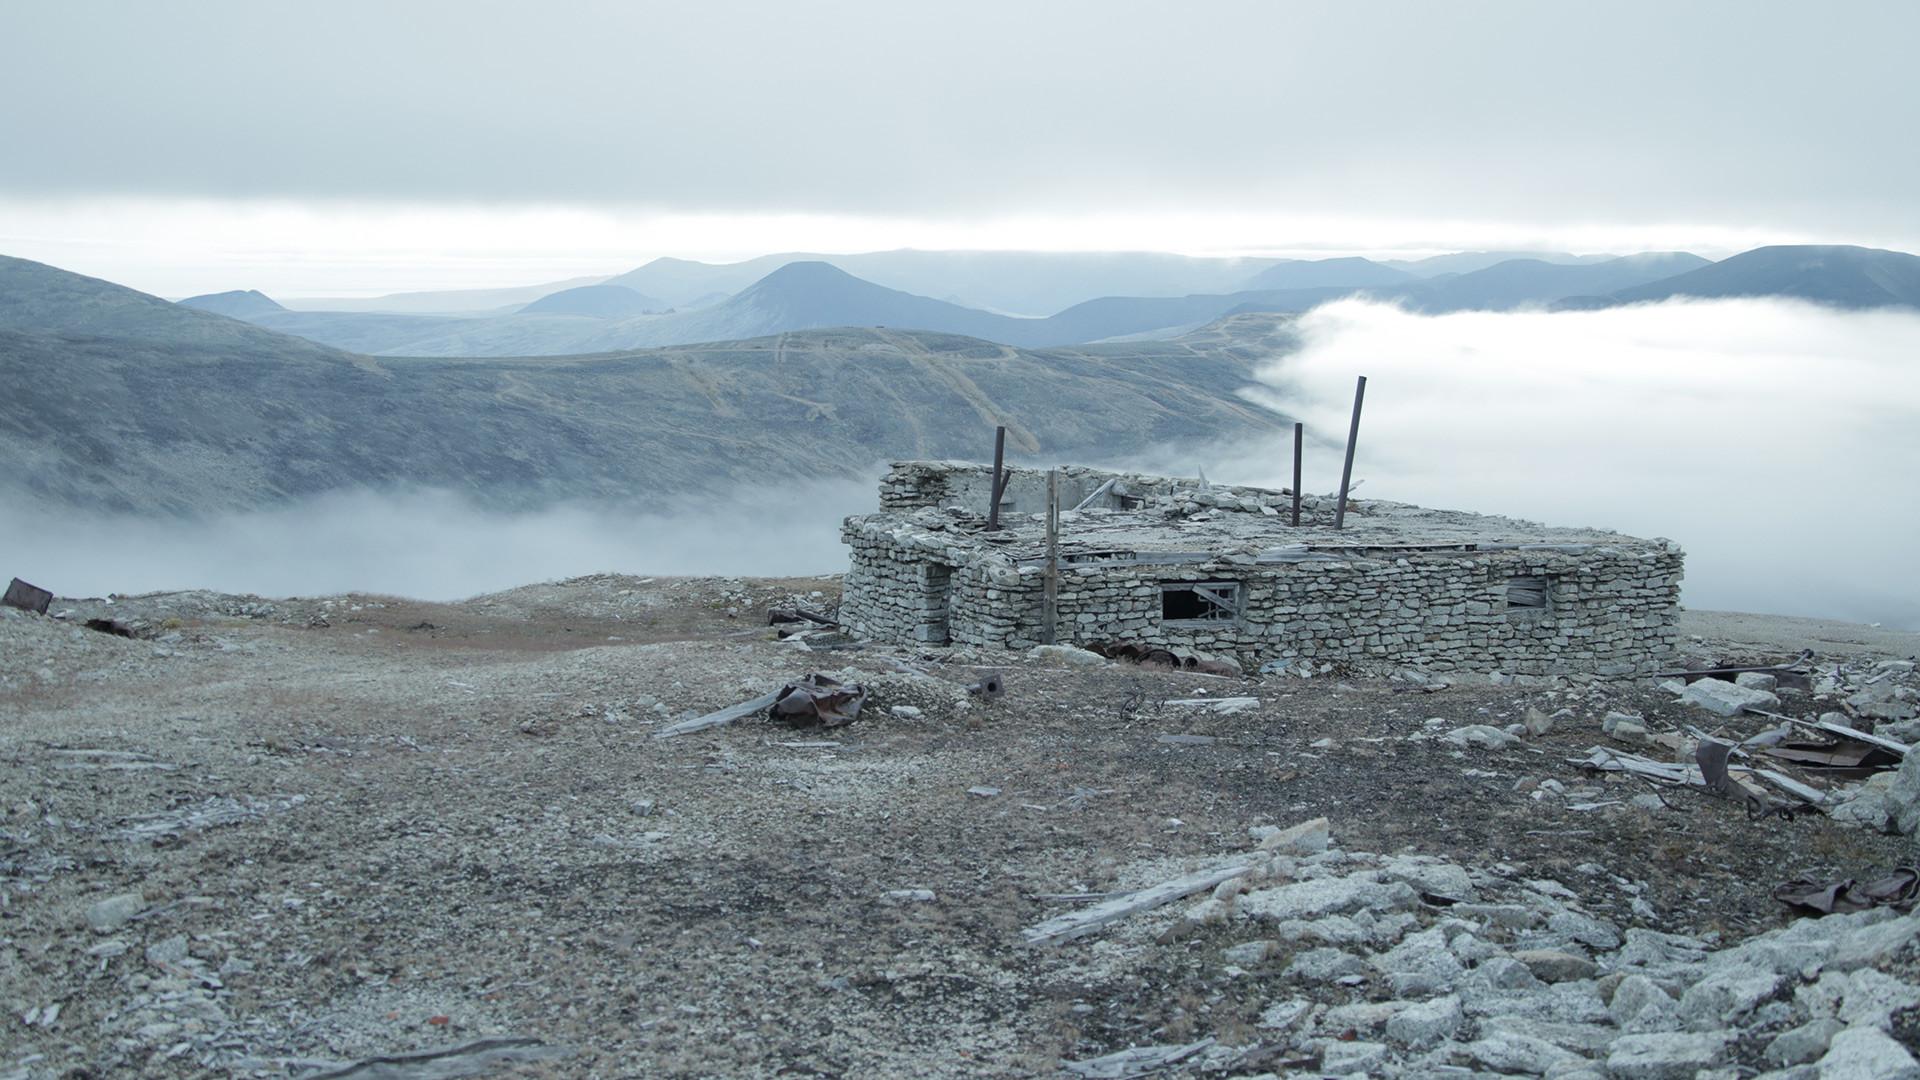 Vostochny (East) uranium camp